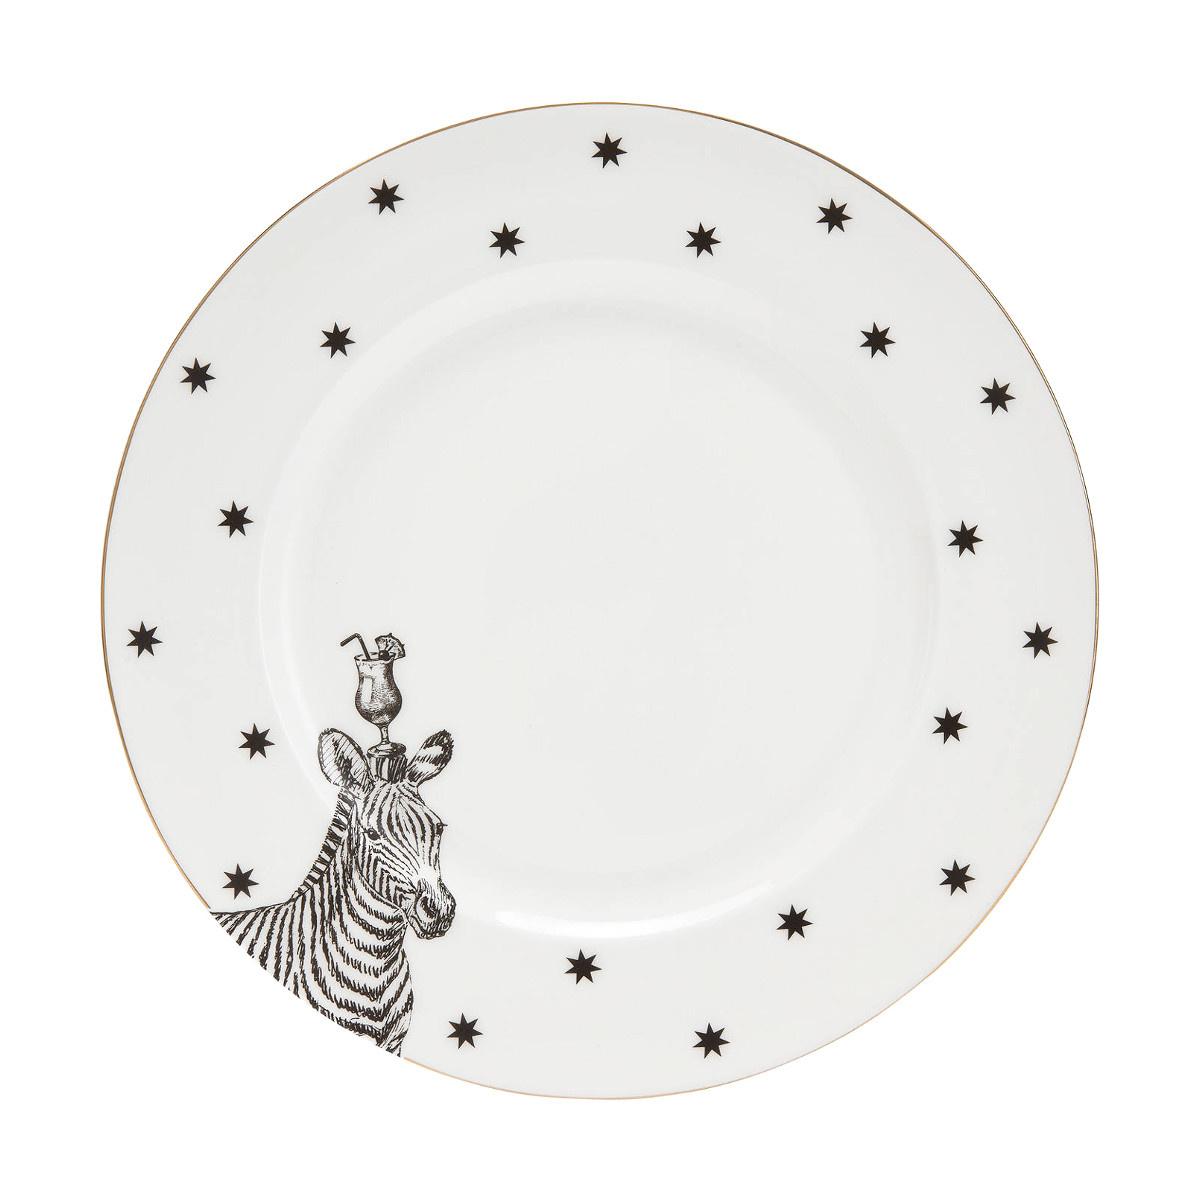 Yvonne Ellen Yvonne Ellen London Monochrome Set van 2 Diner borden Ø 26,5 cm - Zebra Print - Bone China Porselein